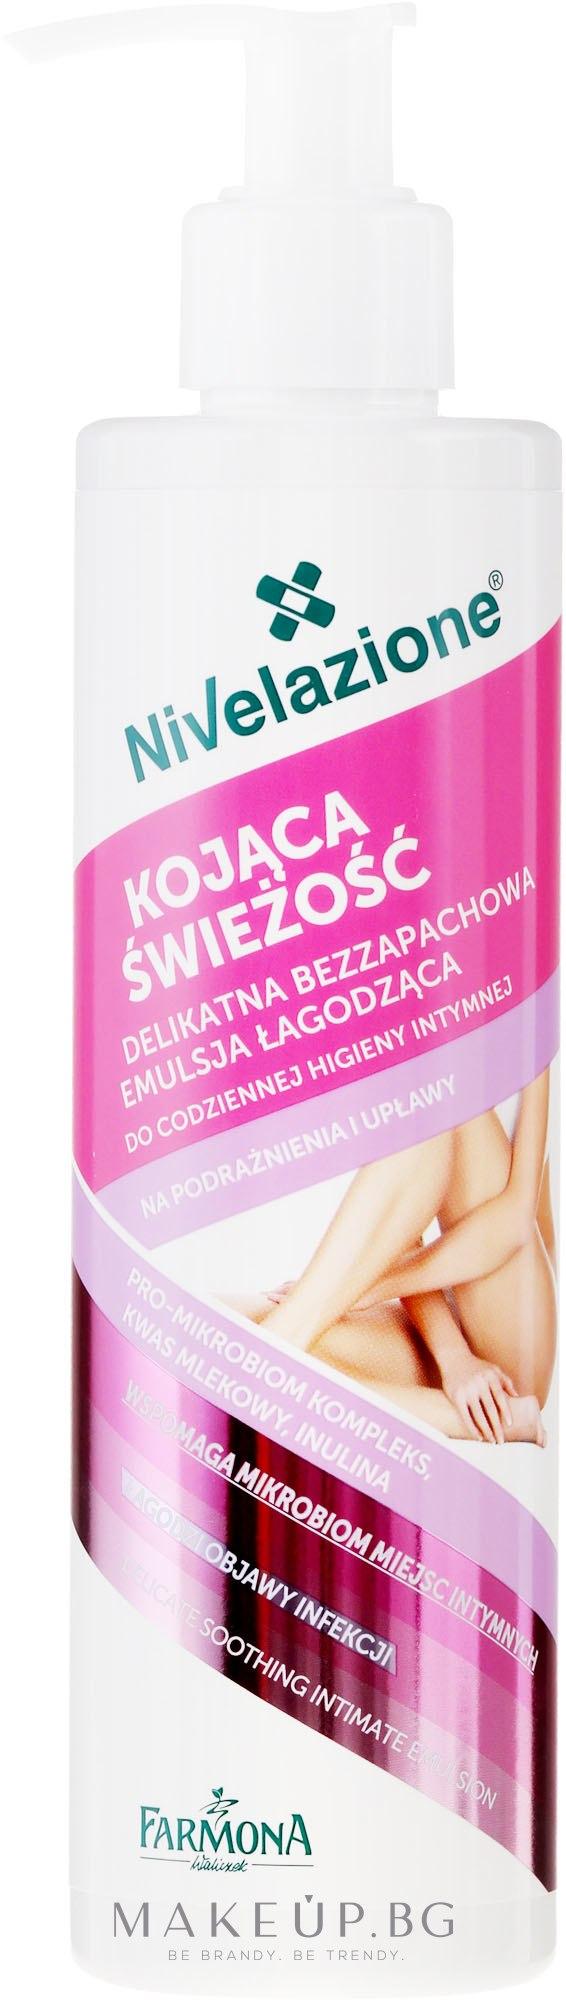 Успокояващ гел за интимна хигиена, без ароматизатори - Farmona Nivelazione Soothing Intimate Gel — снимка 250 ml